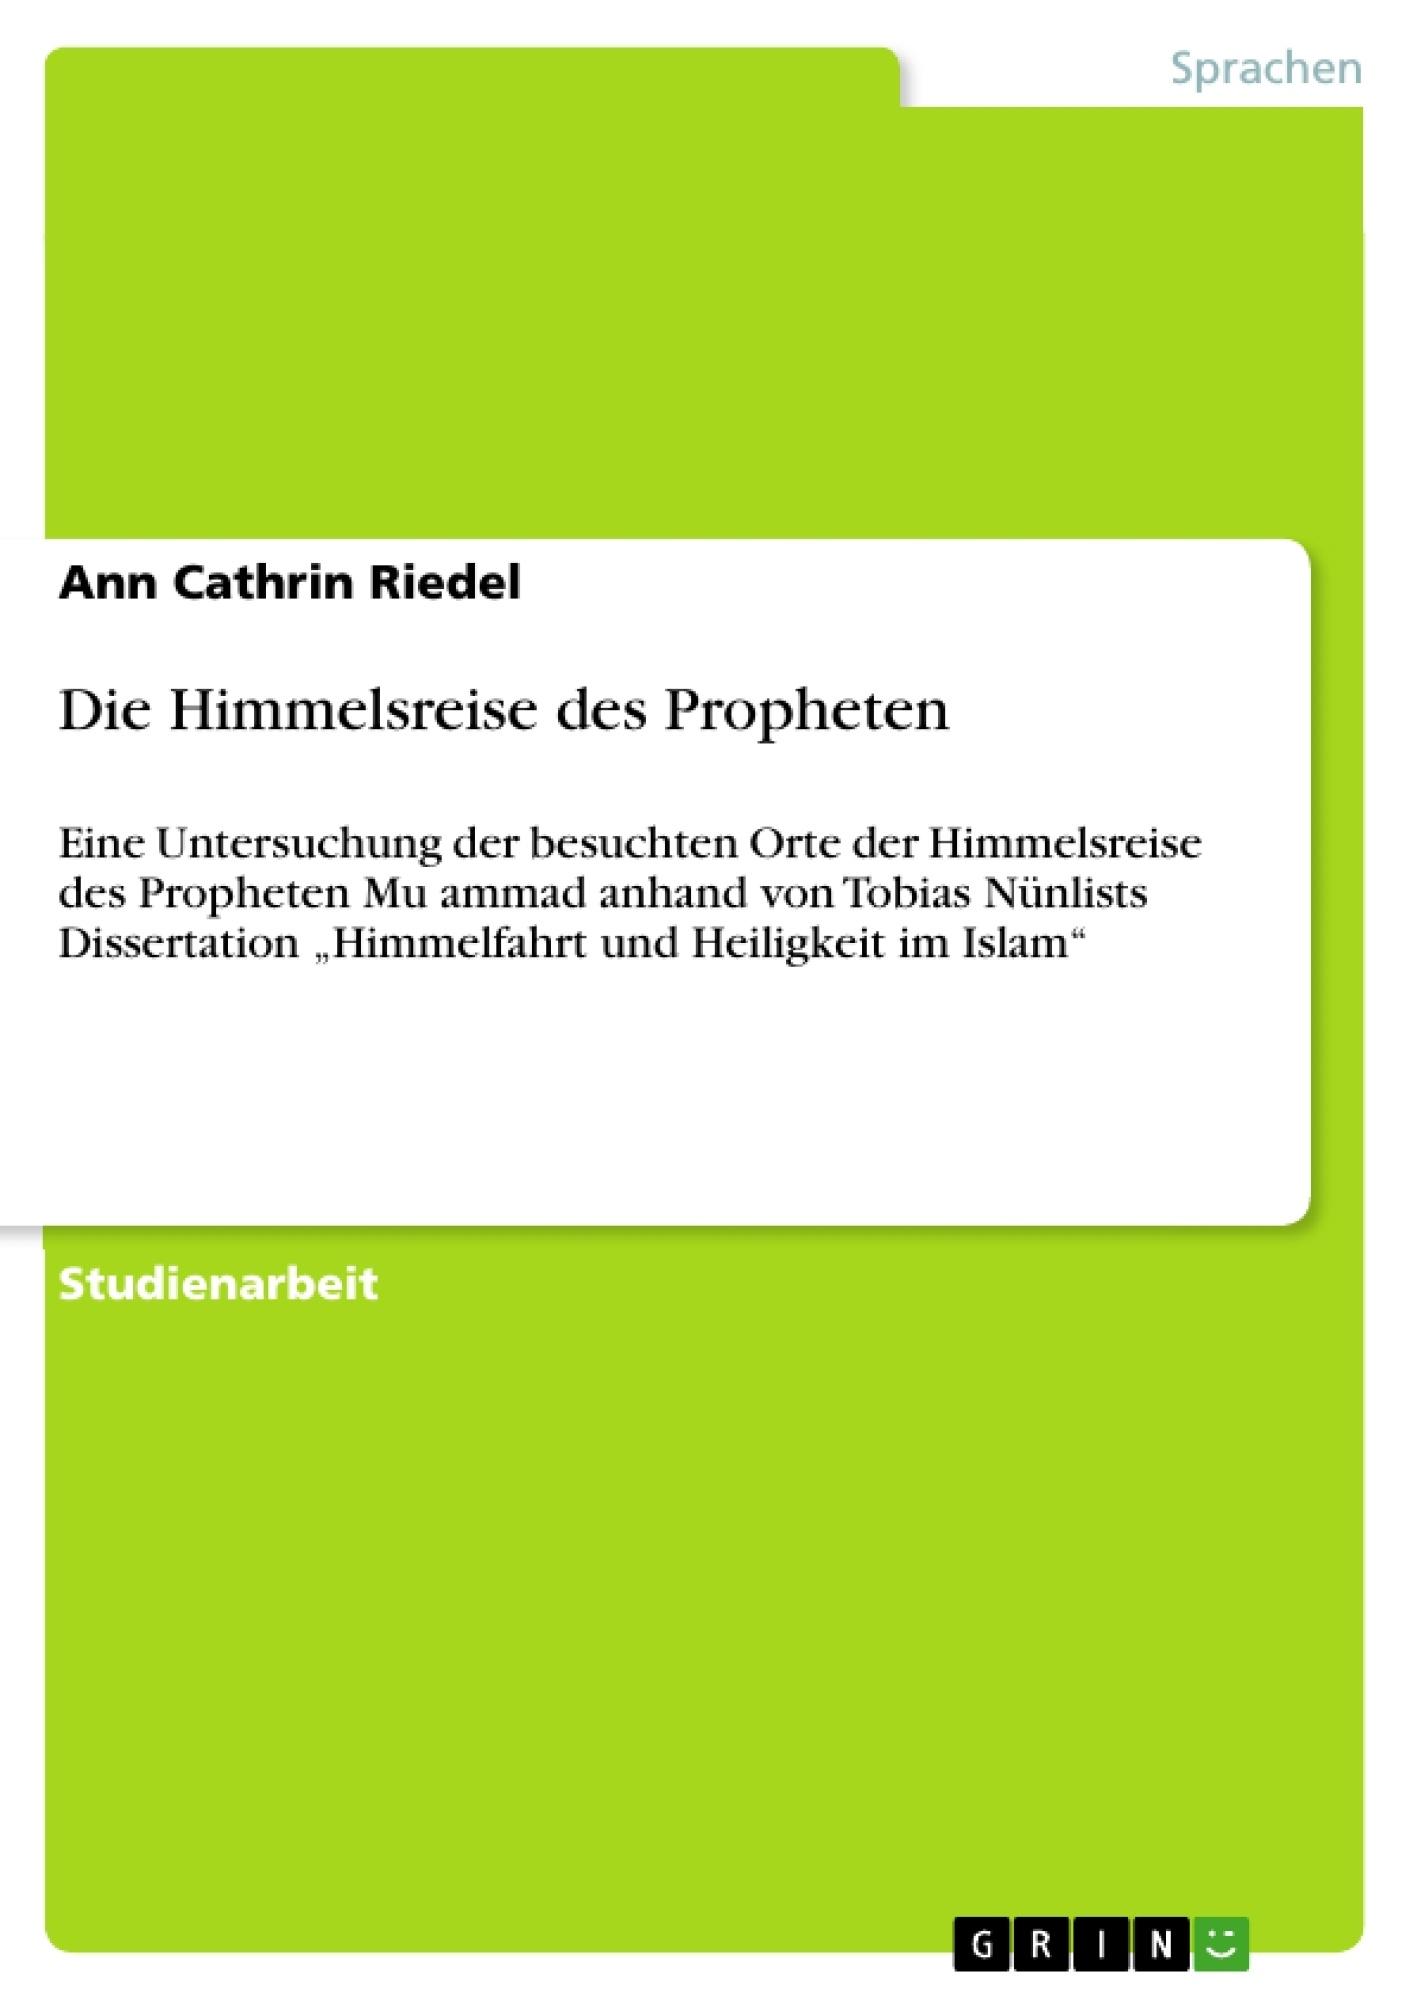 Titel: Die Himmelsreise des Propheten